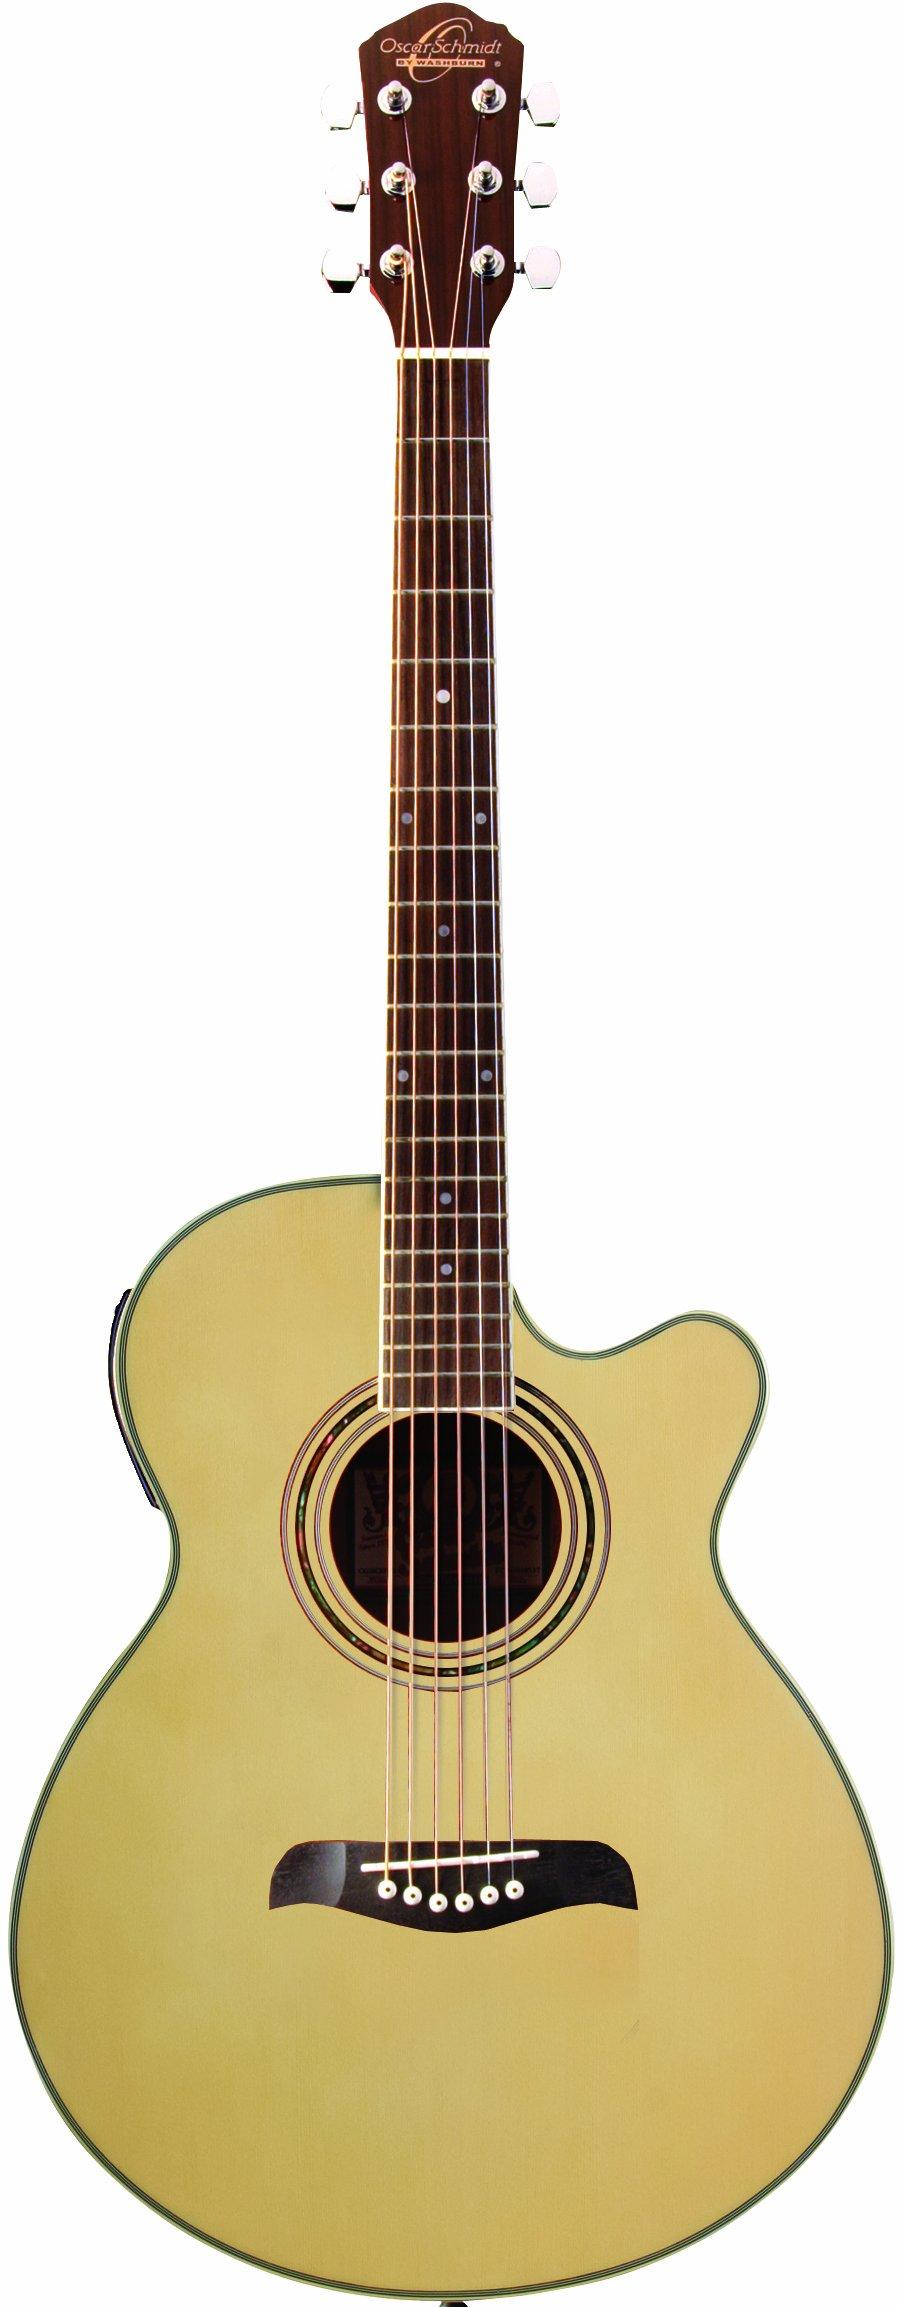 Oscar Schmidt OG10CEN-A-U Concert-Size Cutaway Acoustic-Electric Guitar - Natural